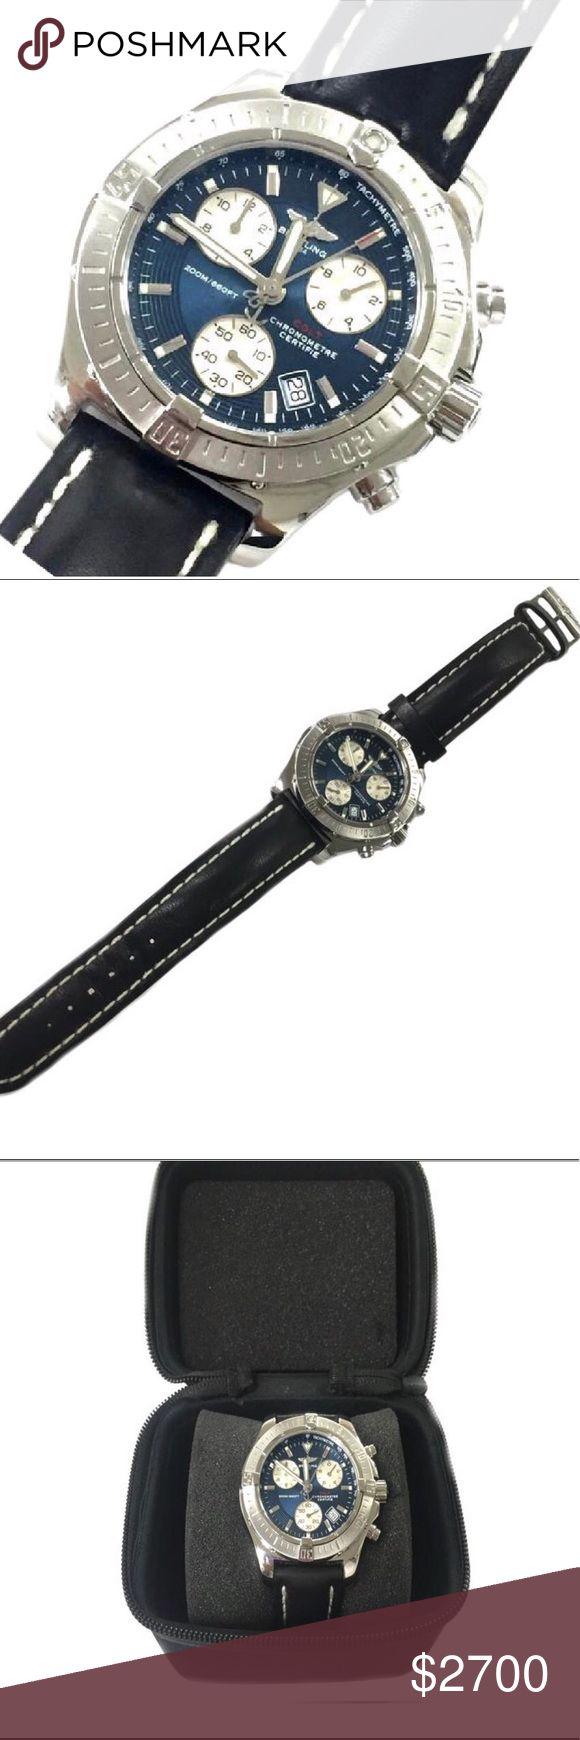 Colt Chronograph Steel Quartz Men's Watch A73380 Manufacture EN Susie Etanche 200M  Breitling 1884 Case diameter 41mm Quartz movement  Blue dial  Black band  Barely worn - no visible signs of wear, scratches, etc Box shown included Breitling Accessories Watches